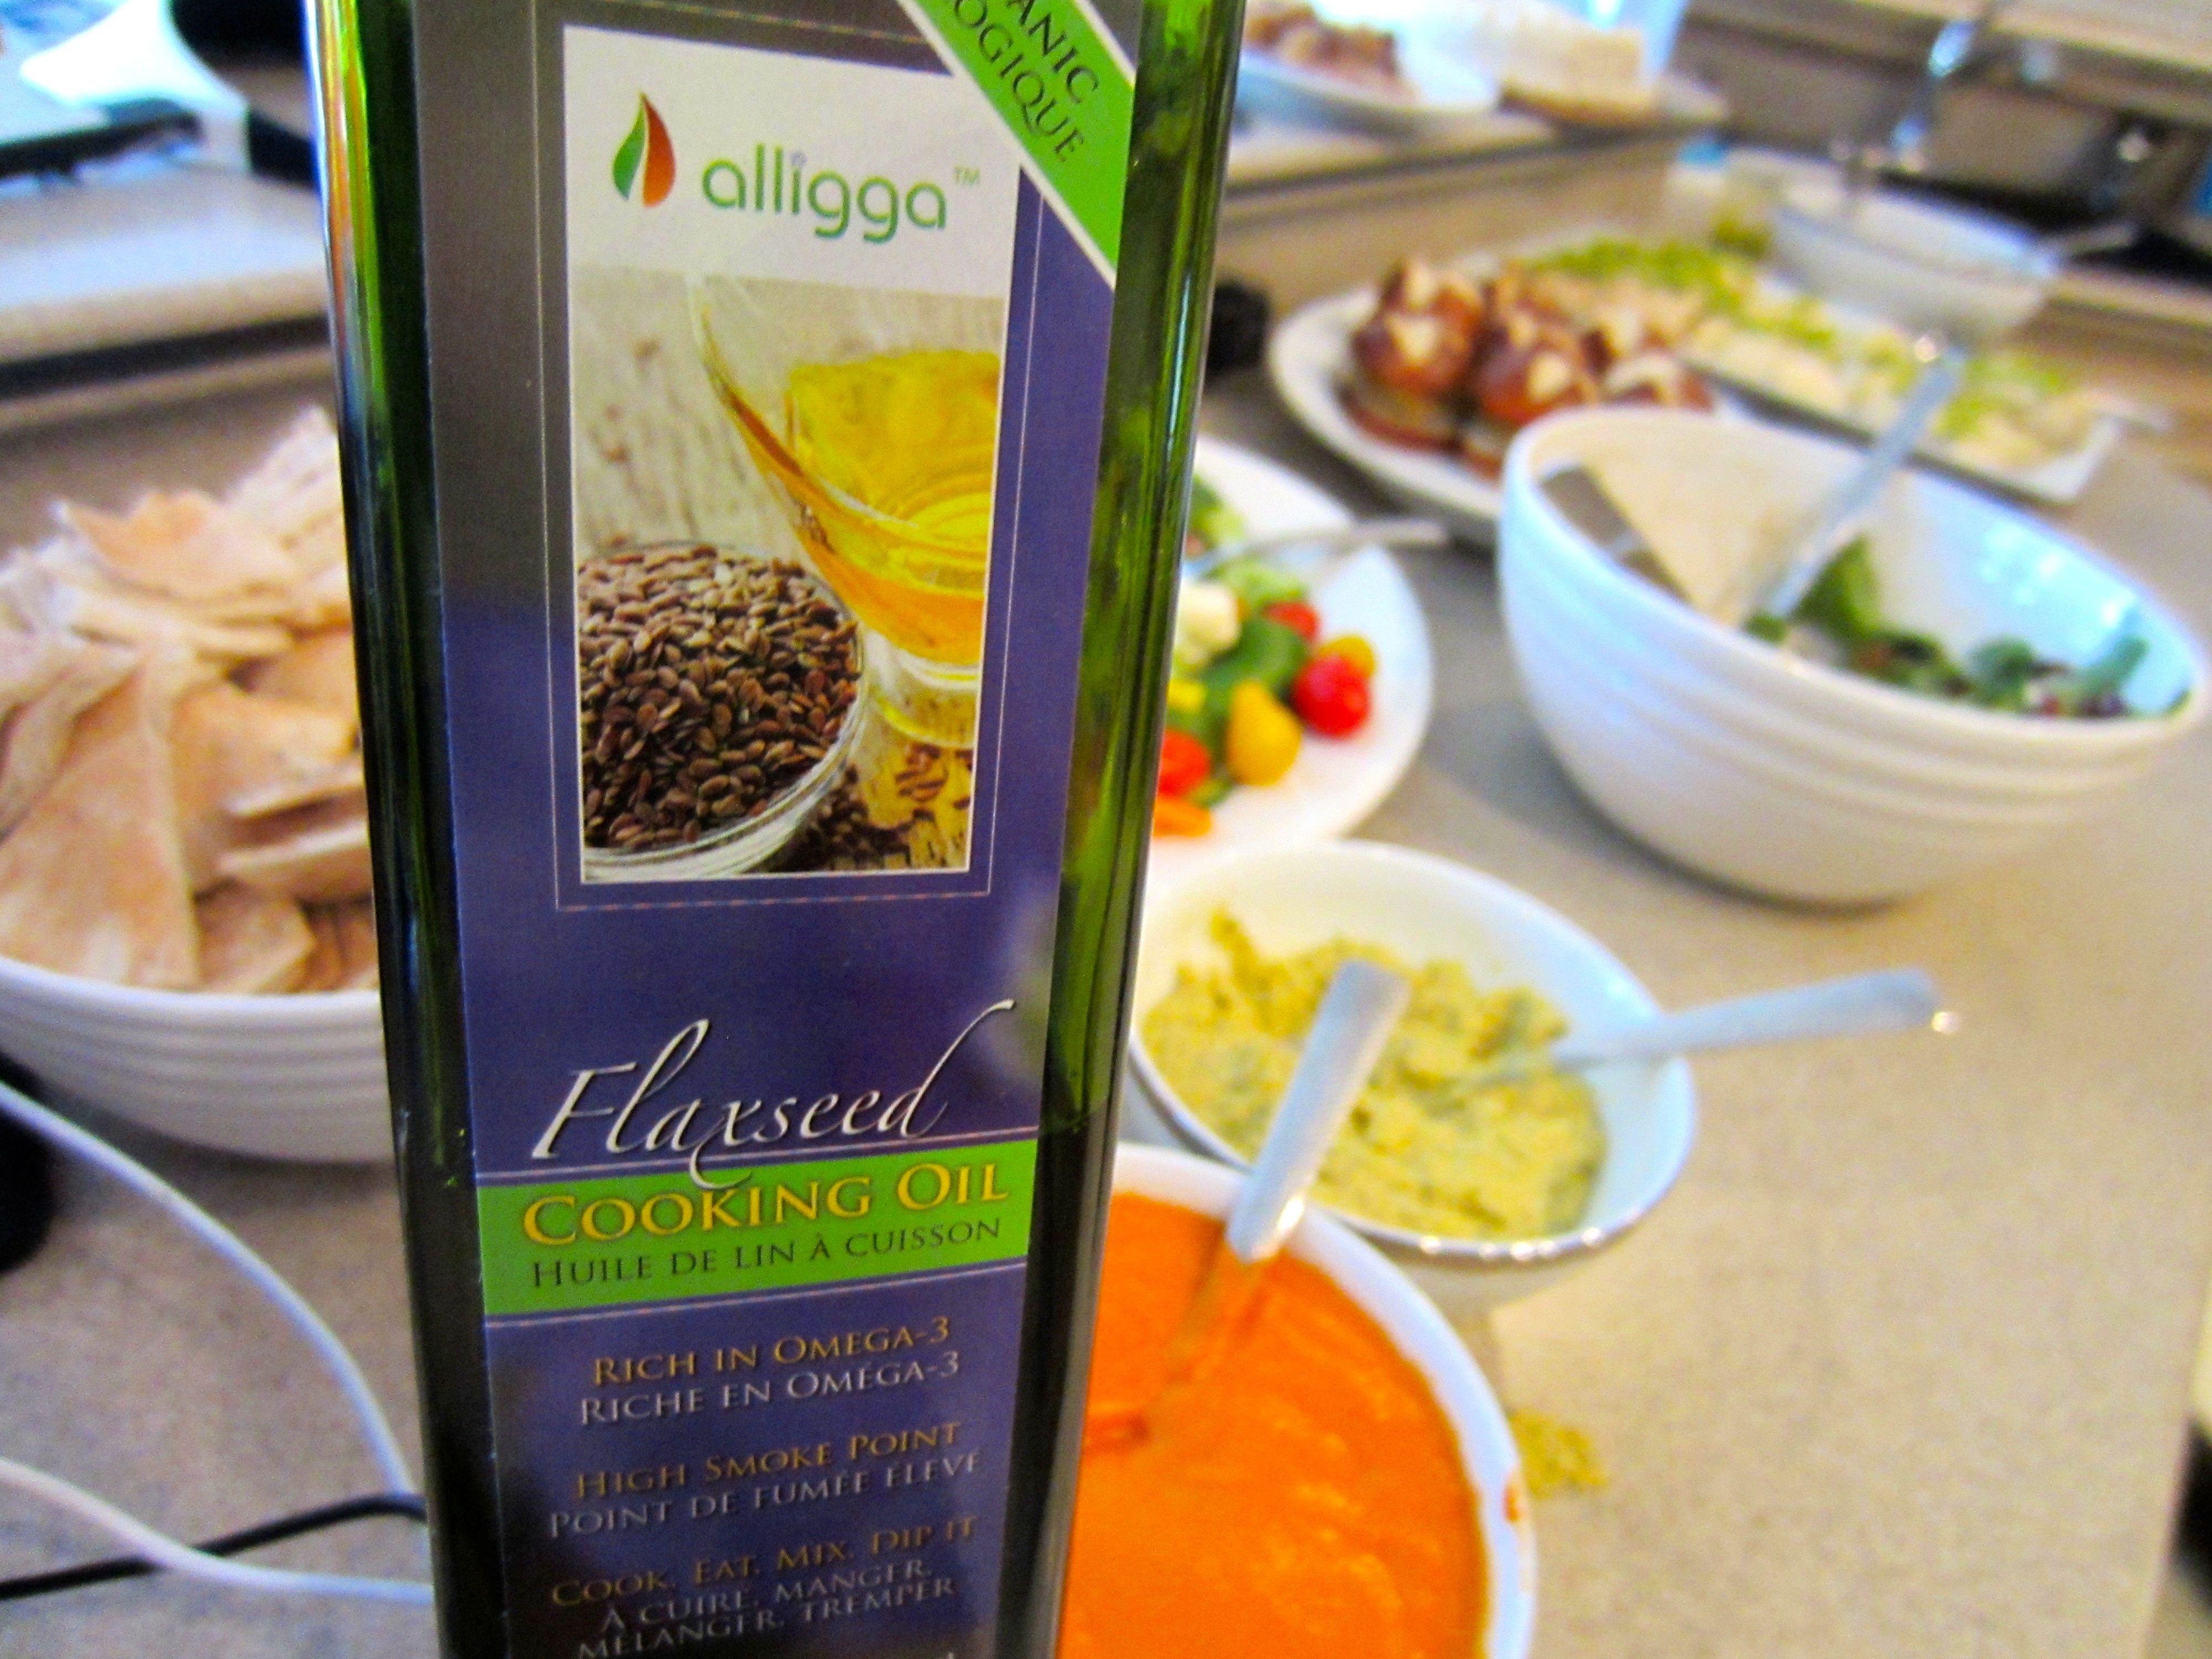 Alligga bottle with food